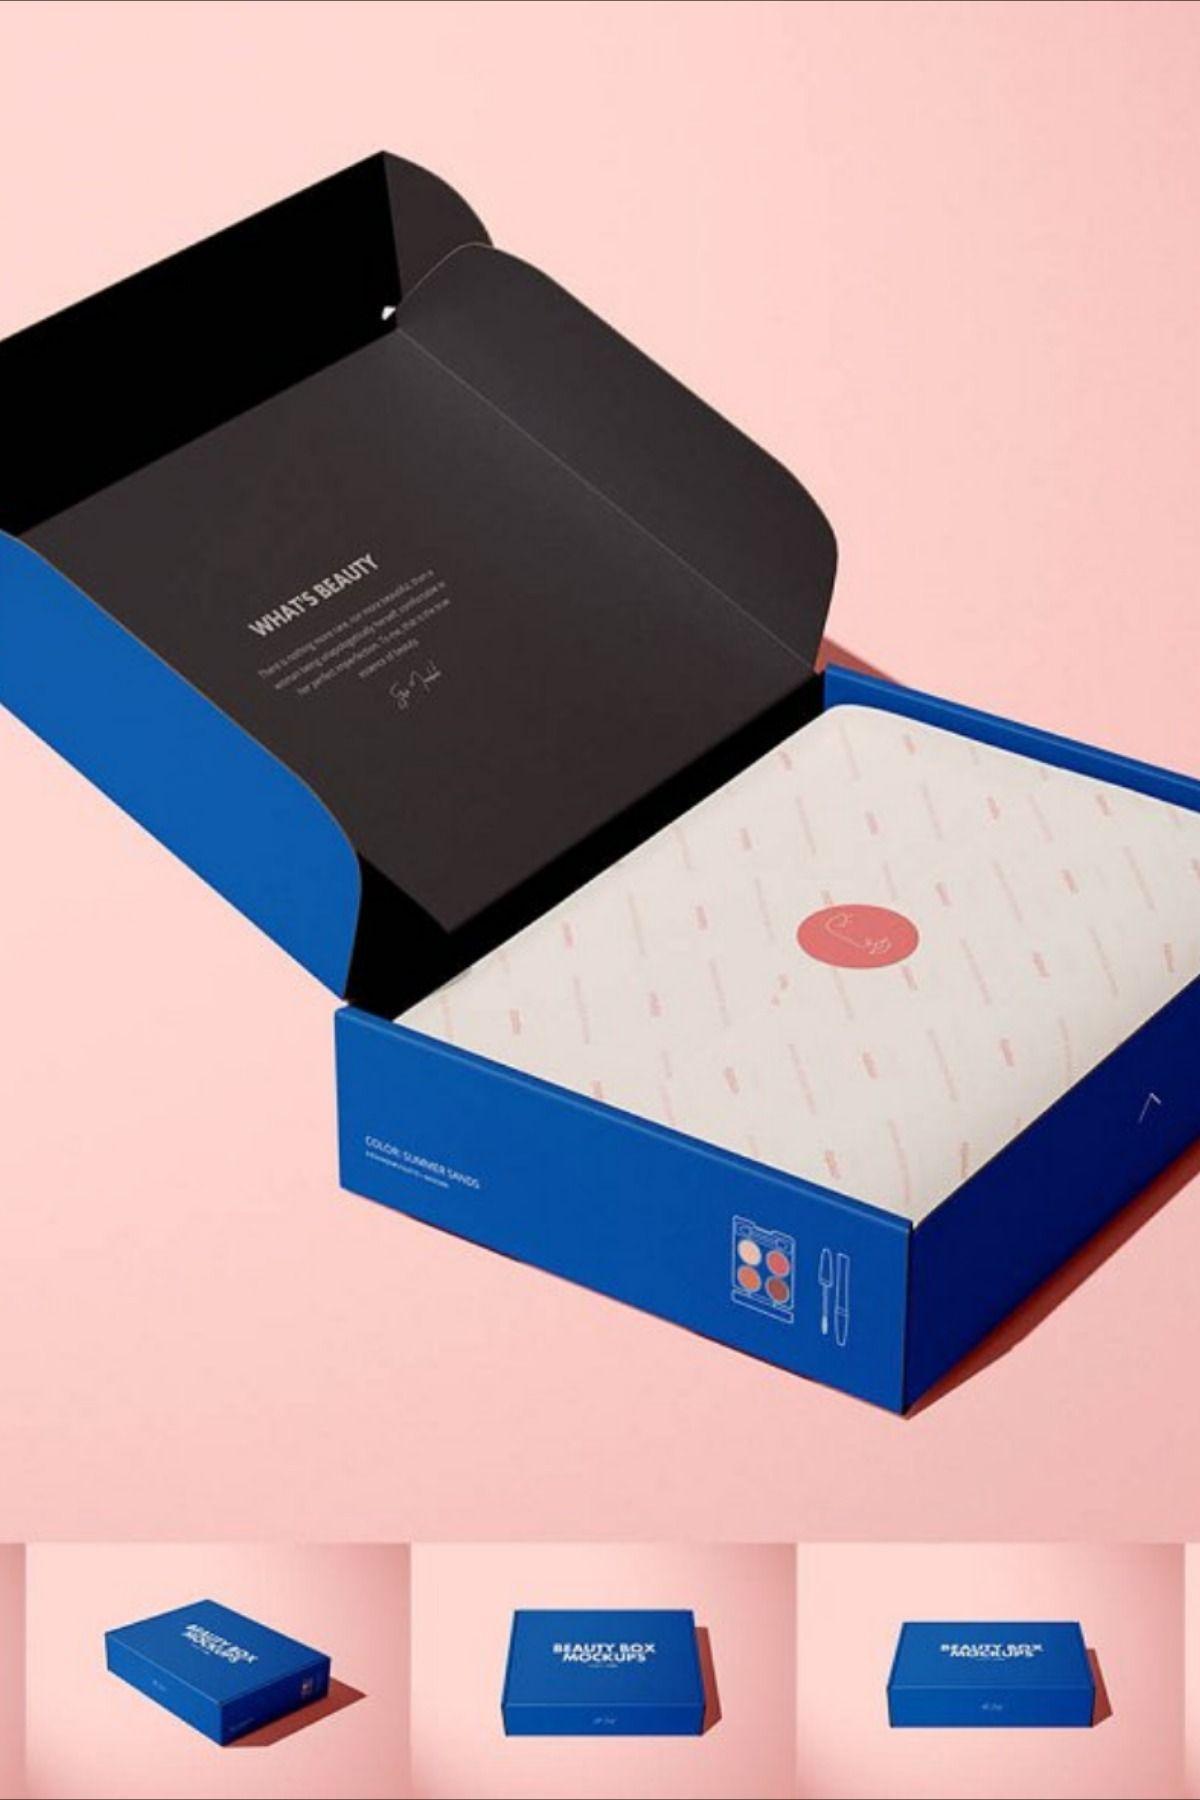 Download Mailing Box 3 Mockup Set Box Template Mockup Paper Mockup